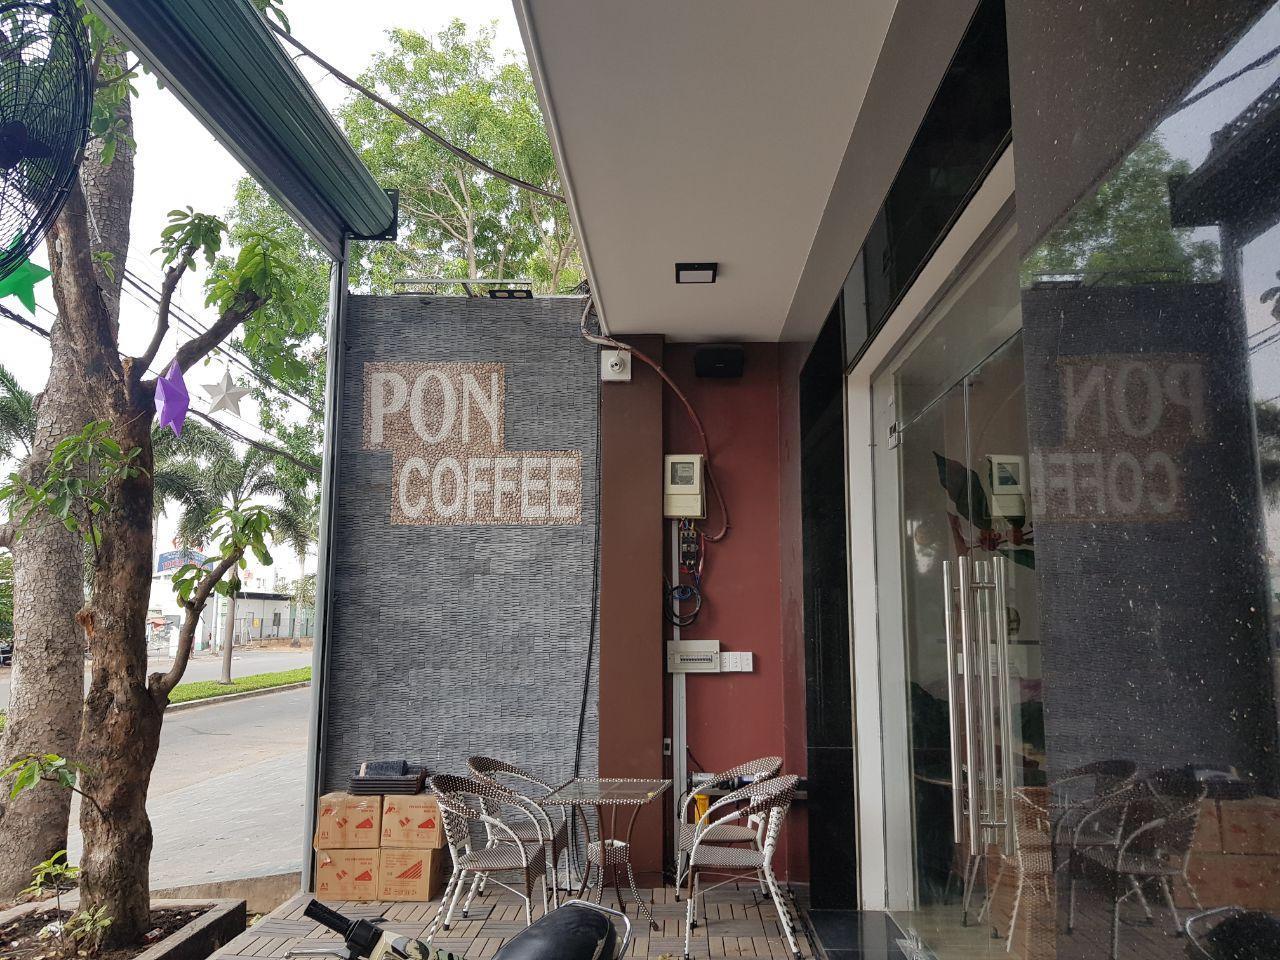 PON COFFEE